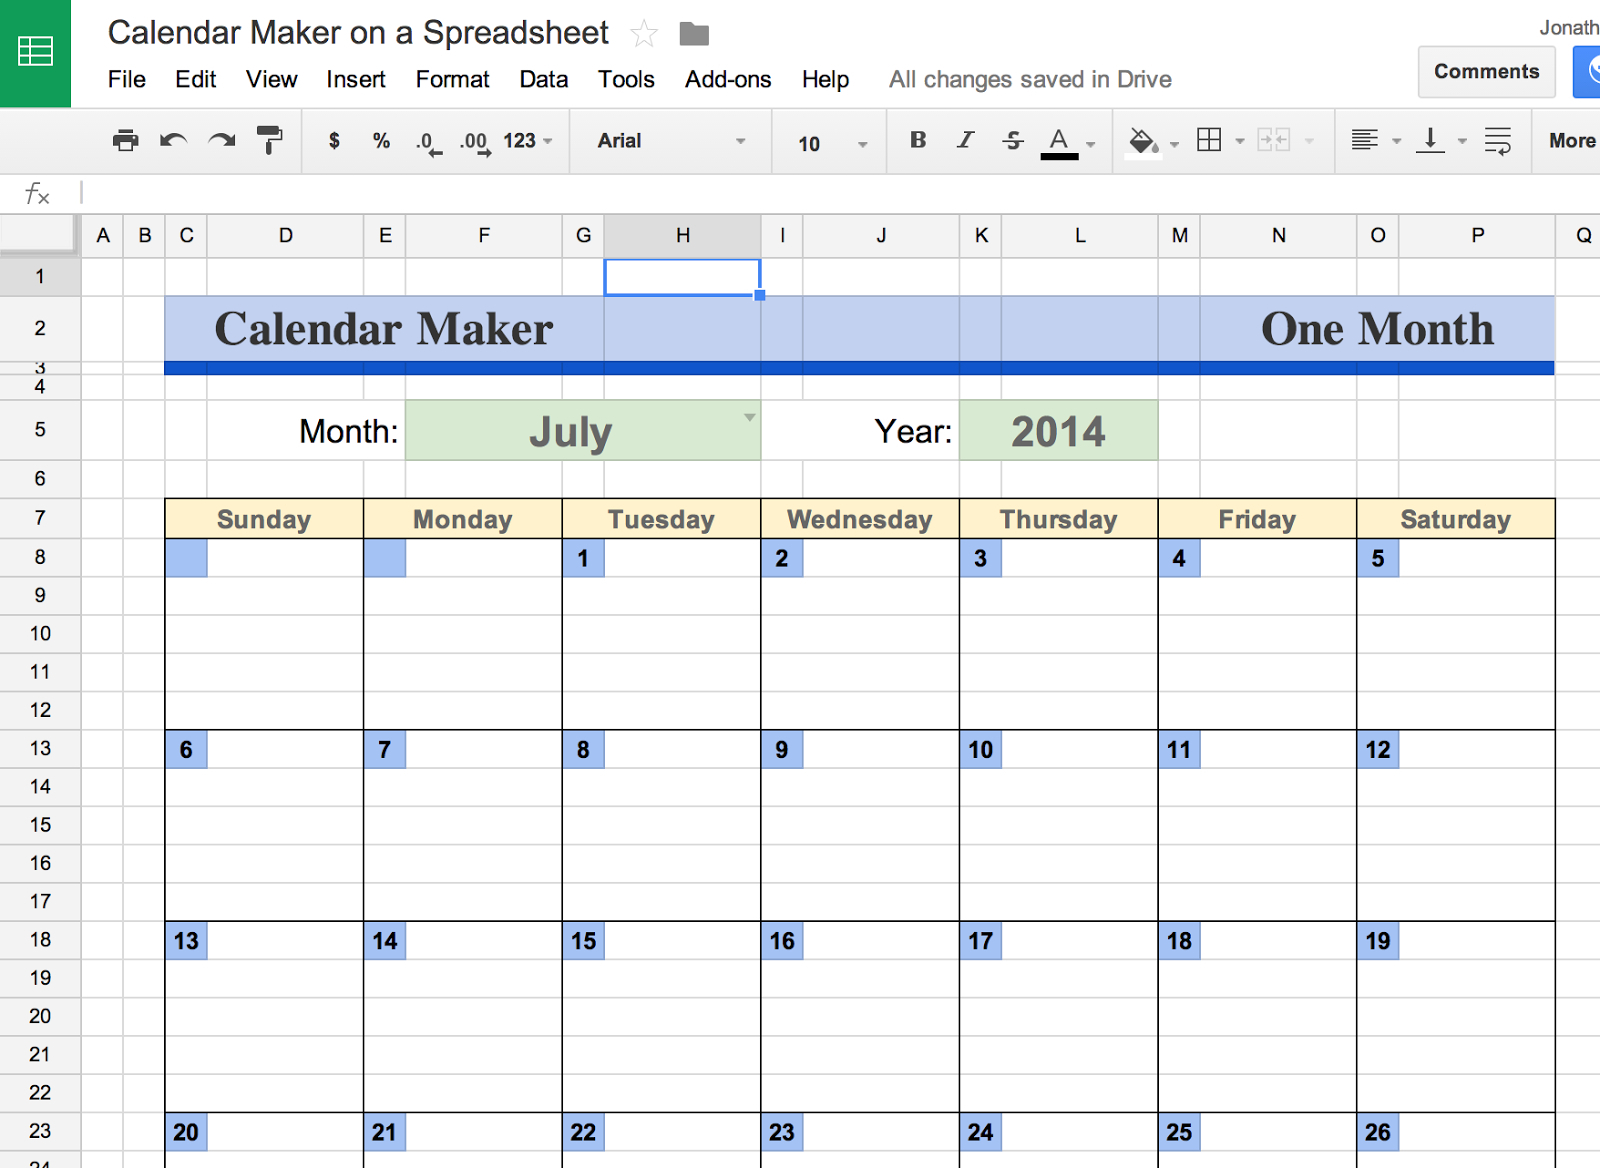 2018 Calendar Spreadsheet Google Sheets For Create A Spreadsheet In Google Docs  Aljererlotgd